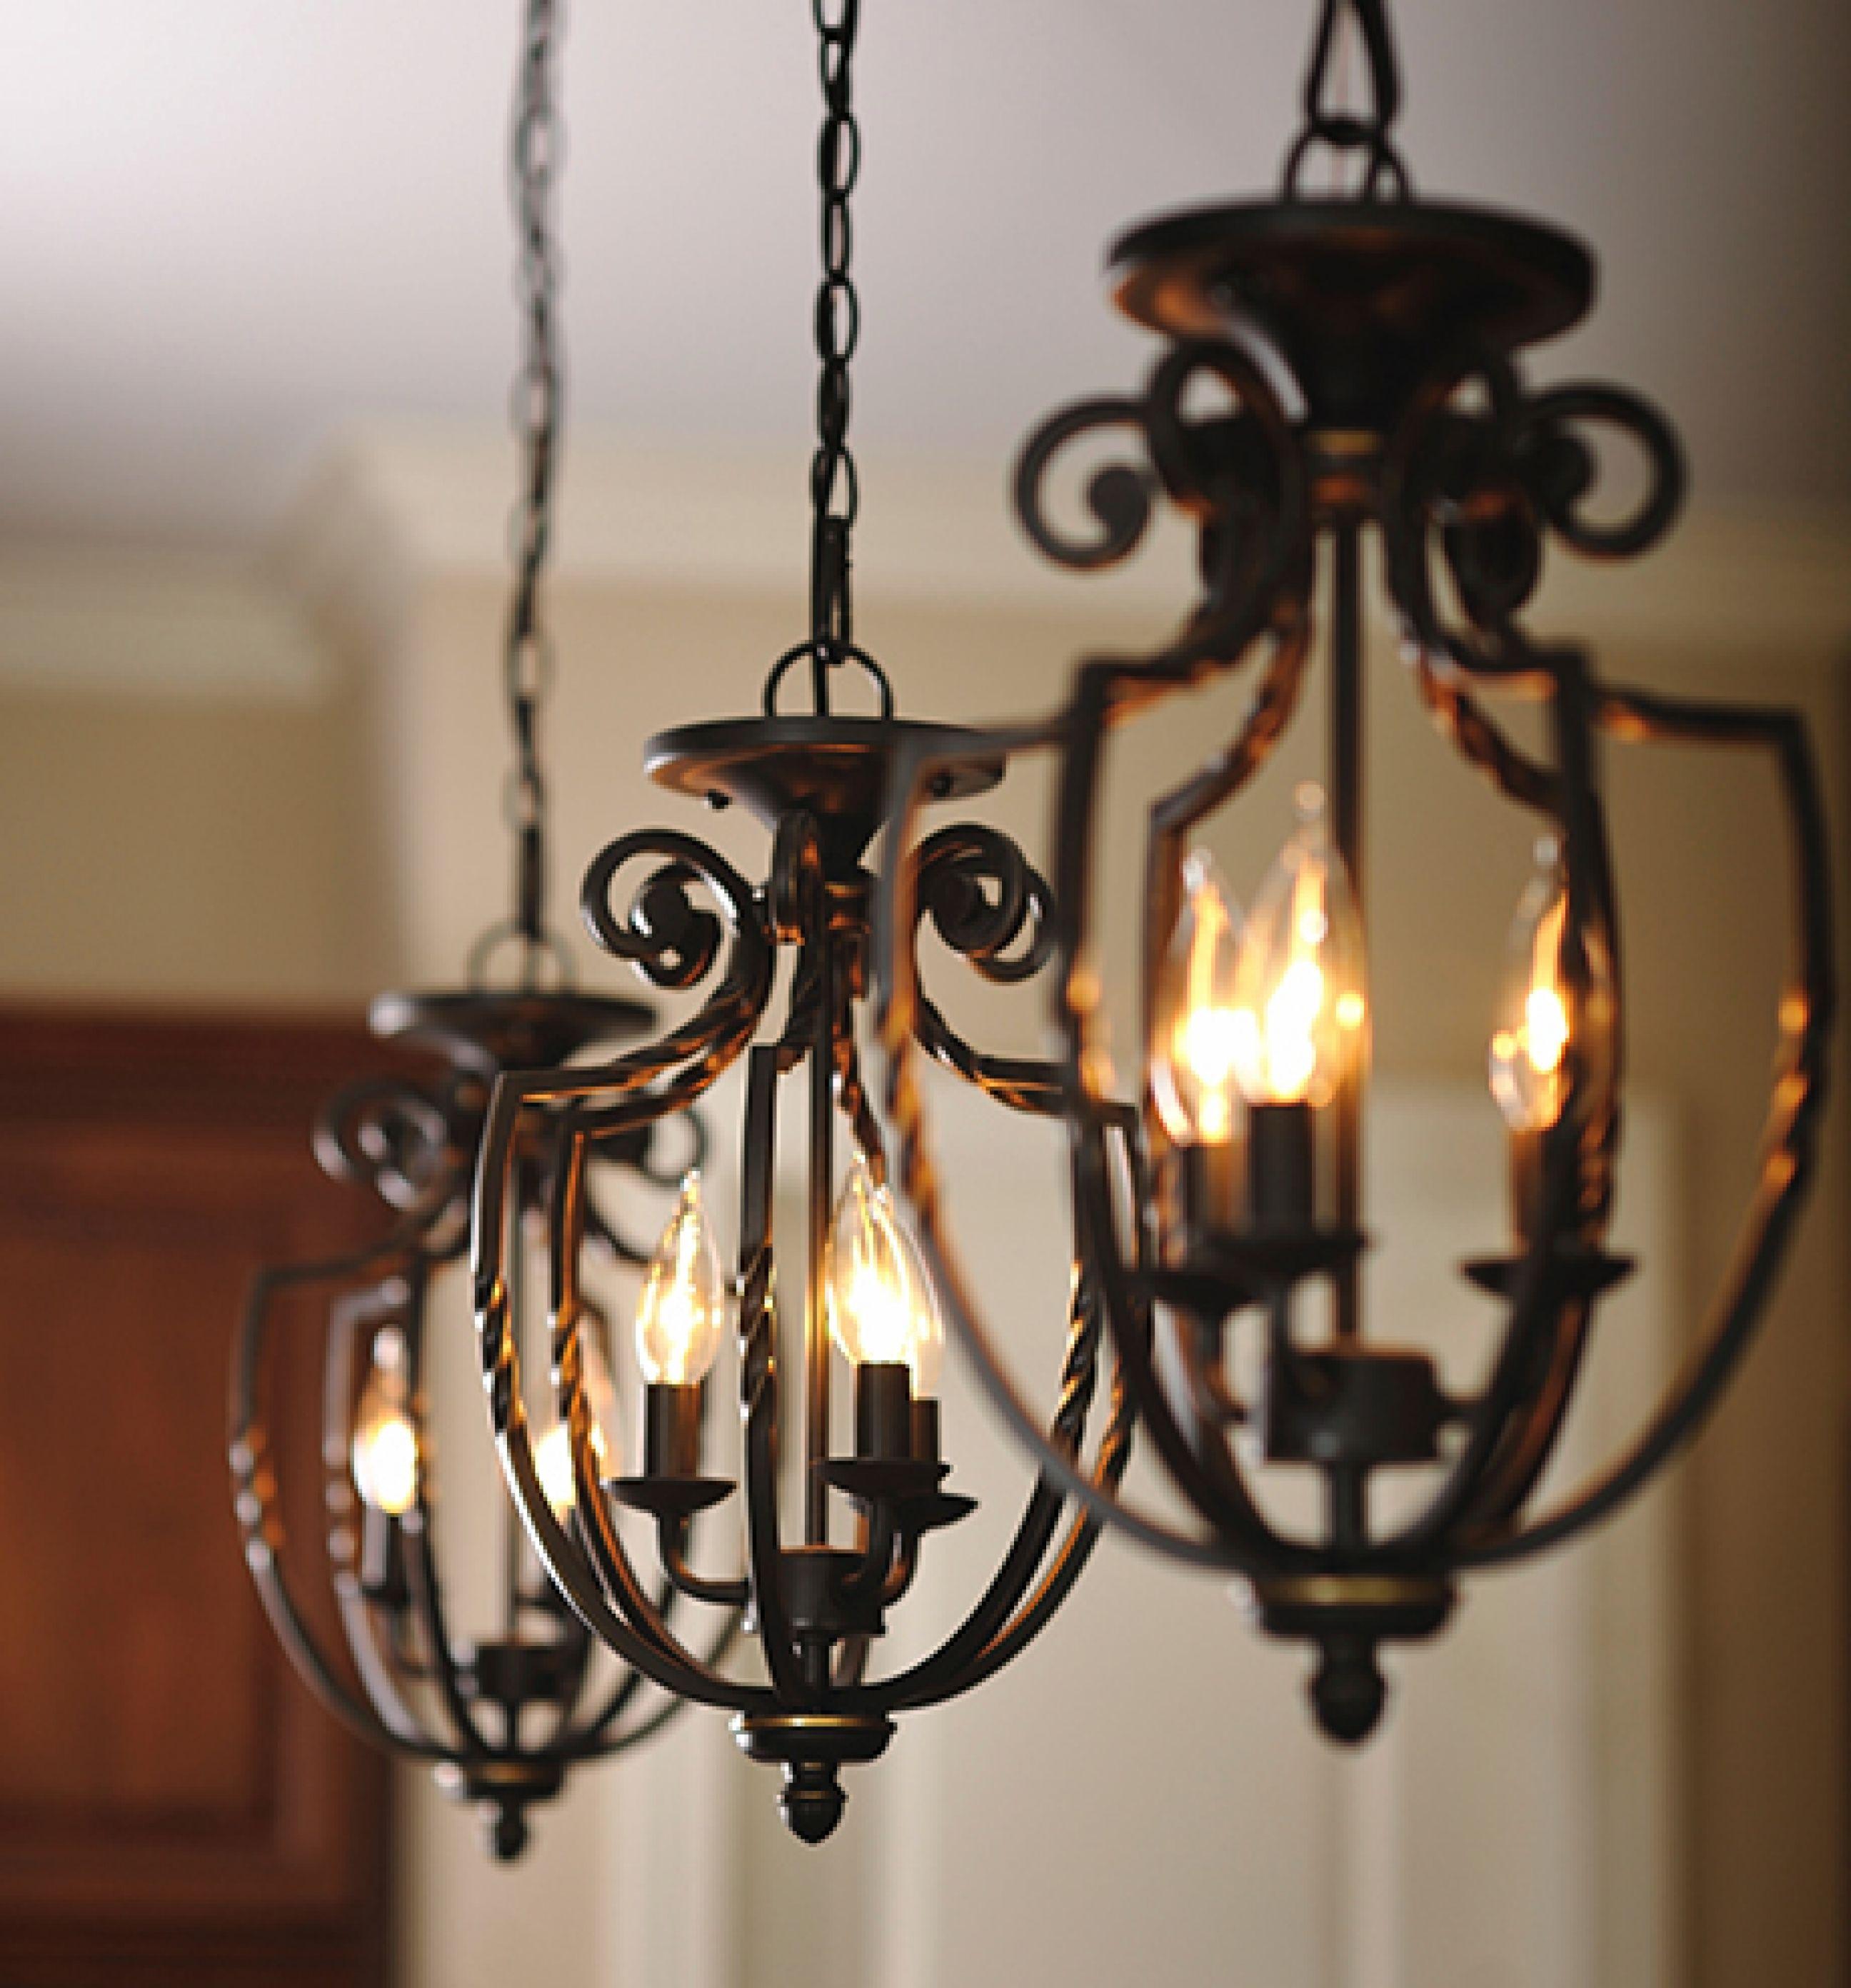 Old World Lighting Fixtures | Lighting Ideas